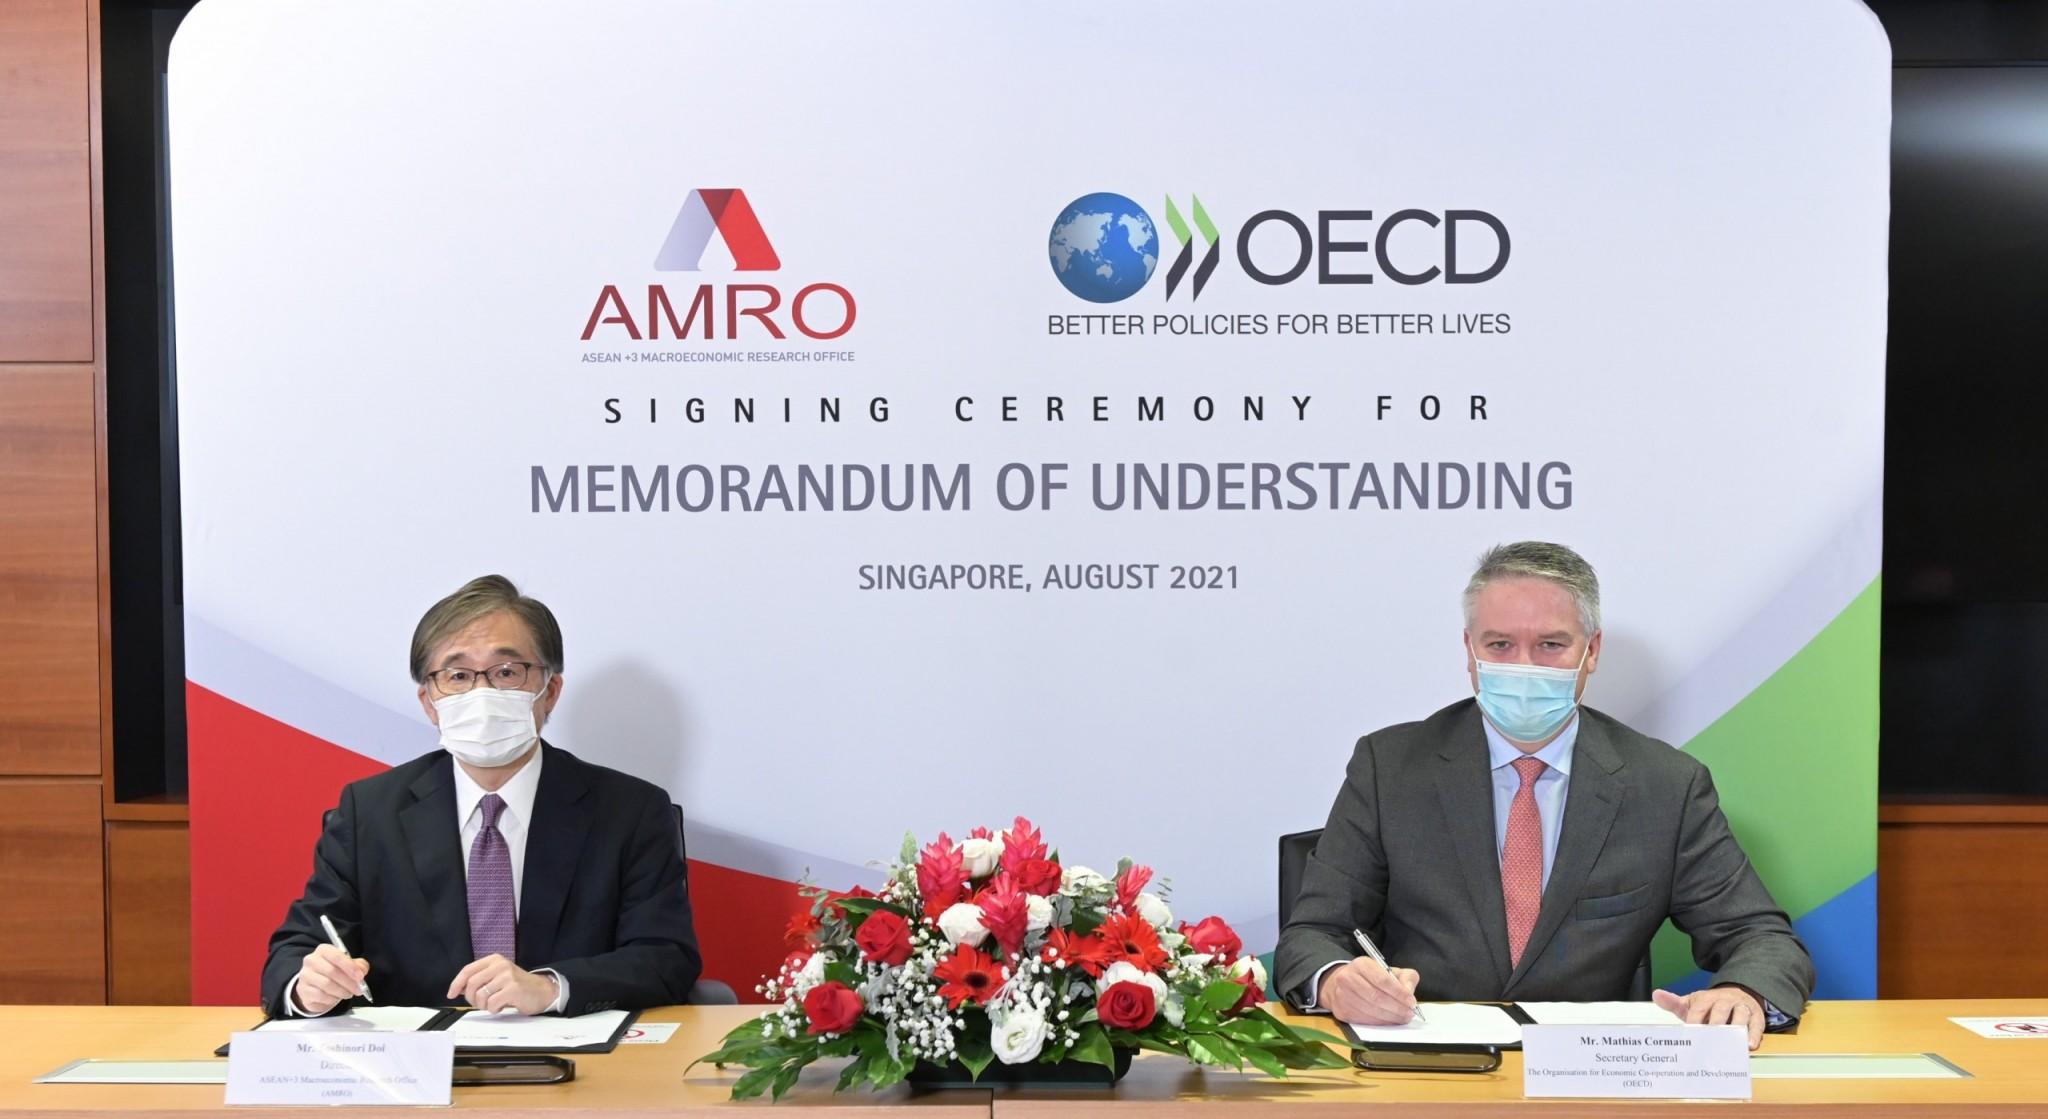 AMRO OECD MoU Signing Ceremony